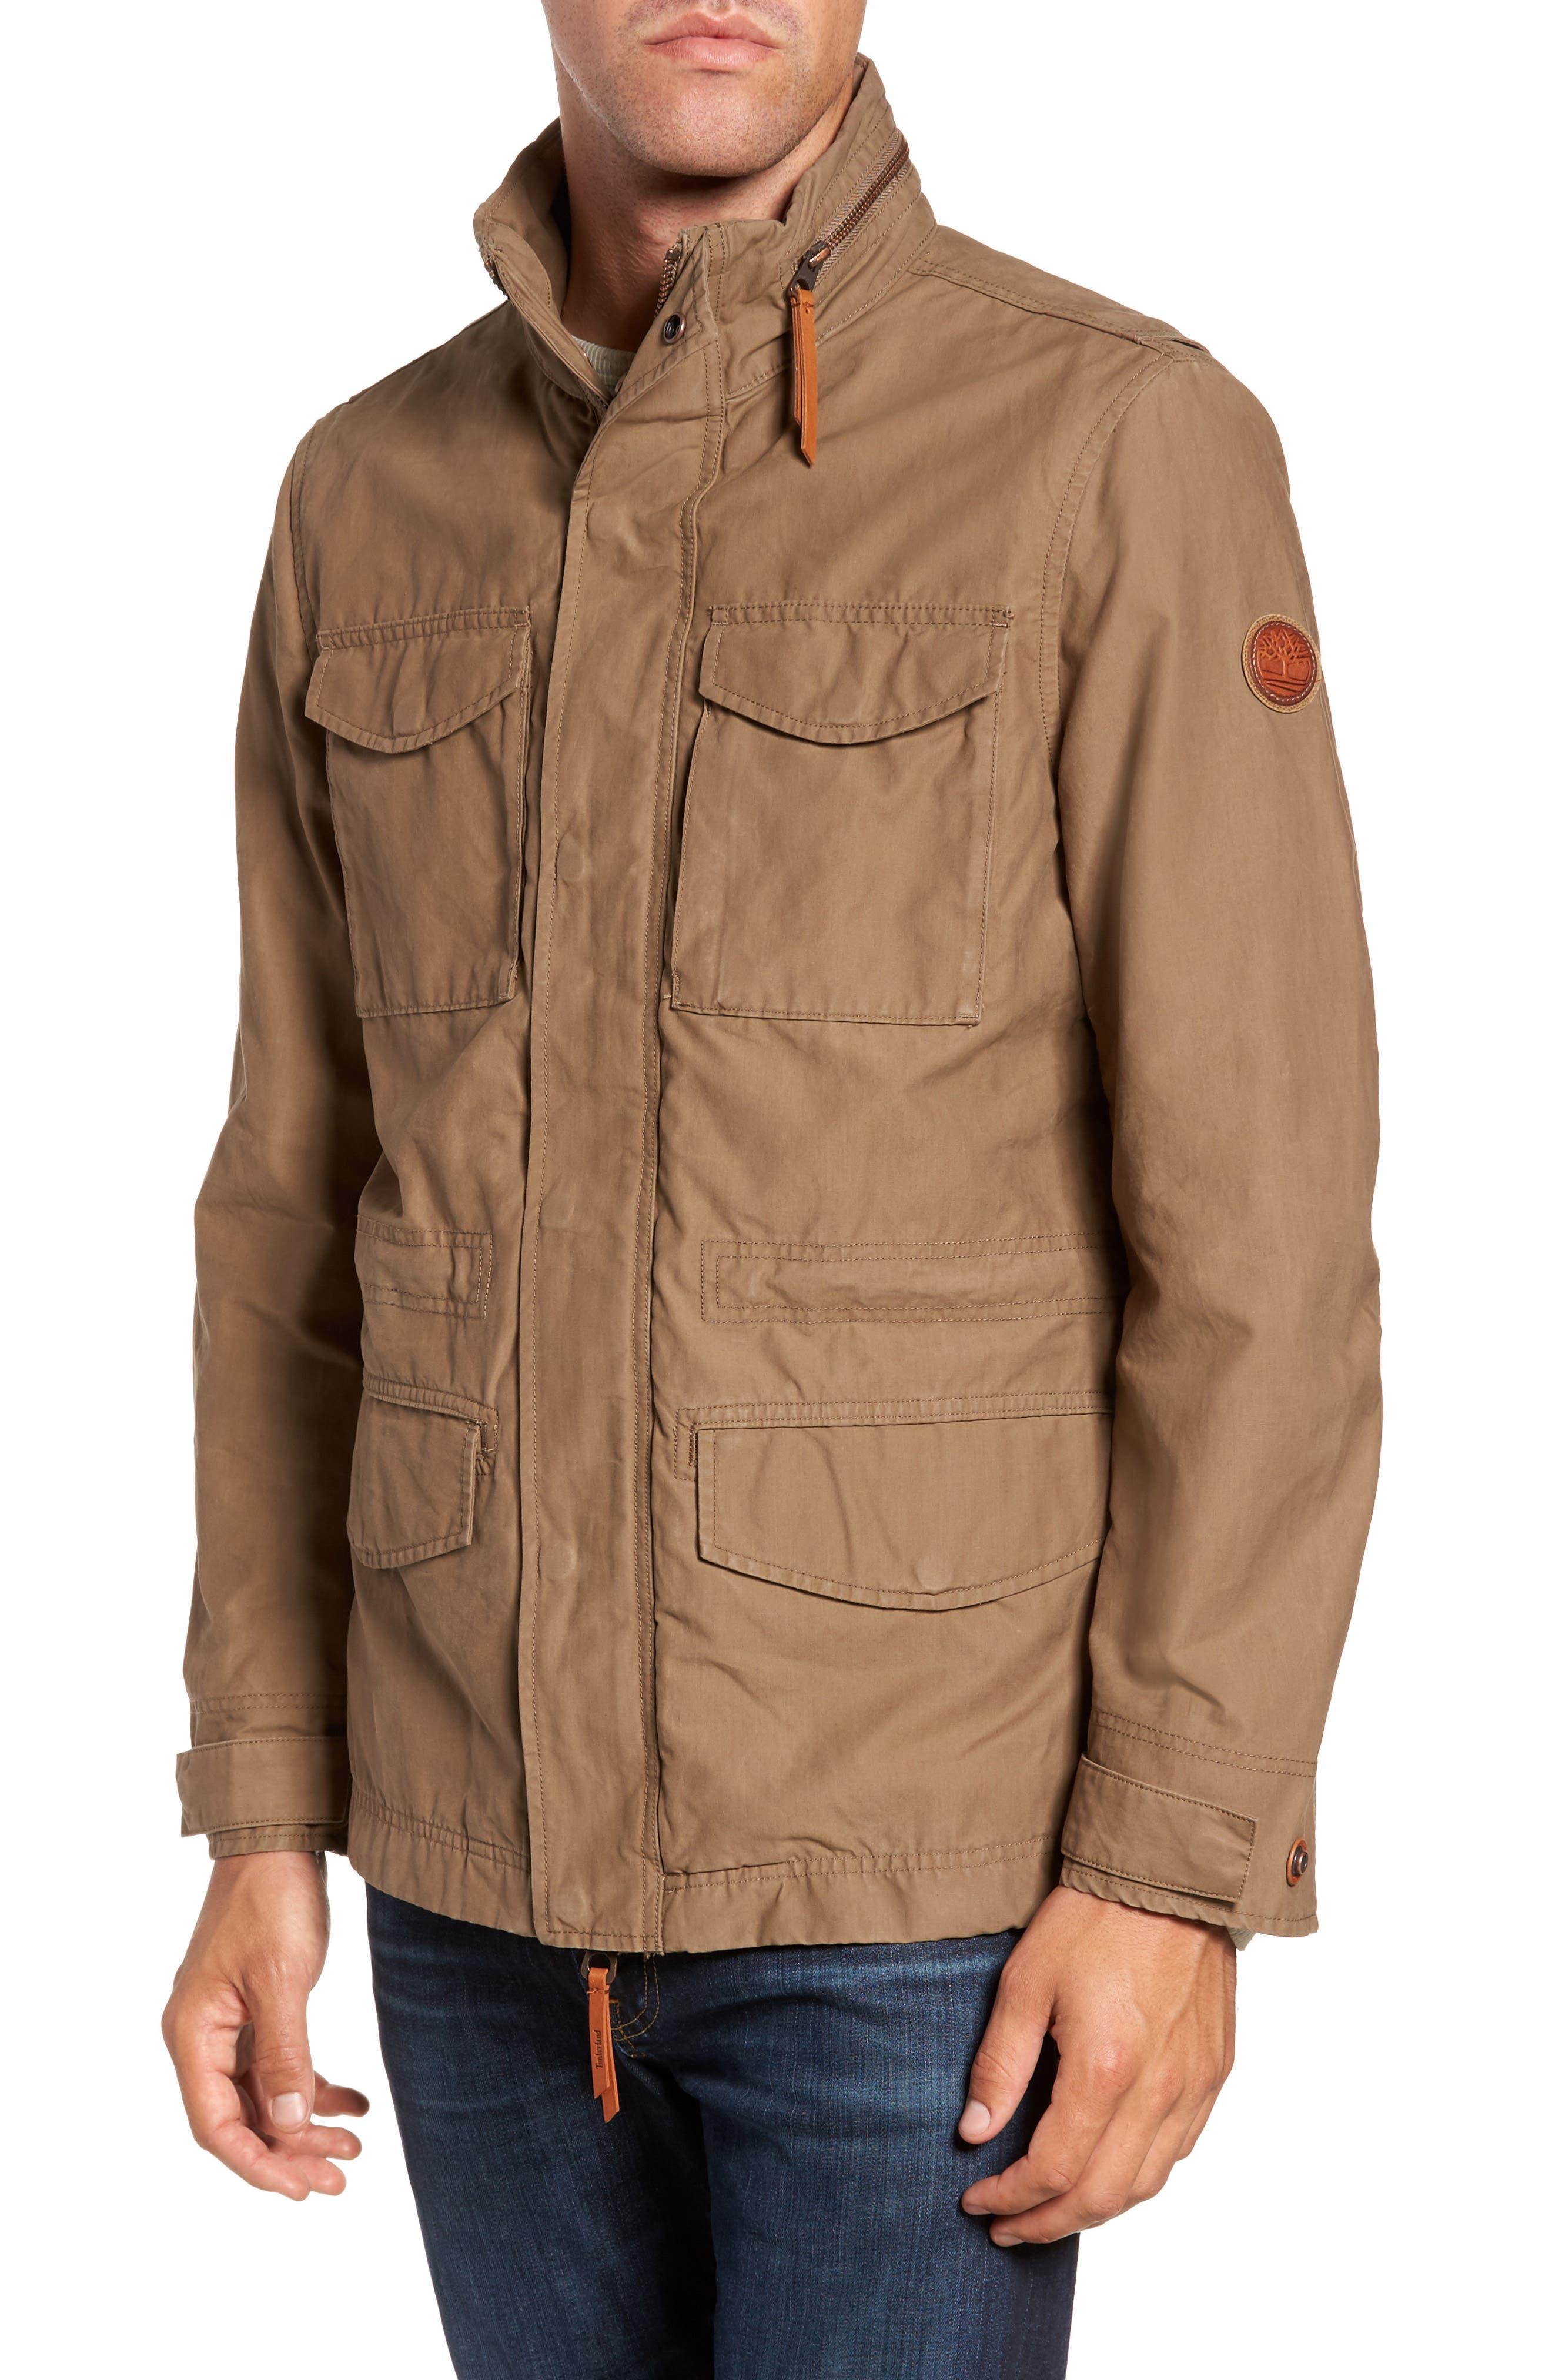 Main Image - Timberland Mt. Davis M65 Waxed Canvas Jacket